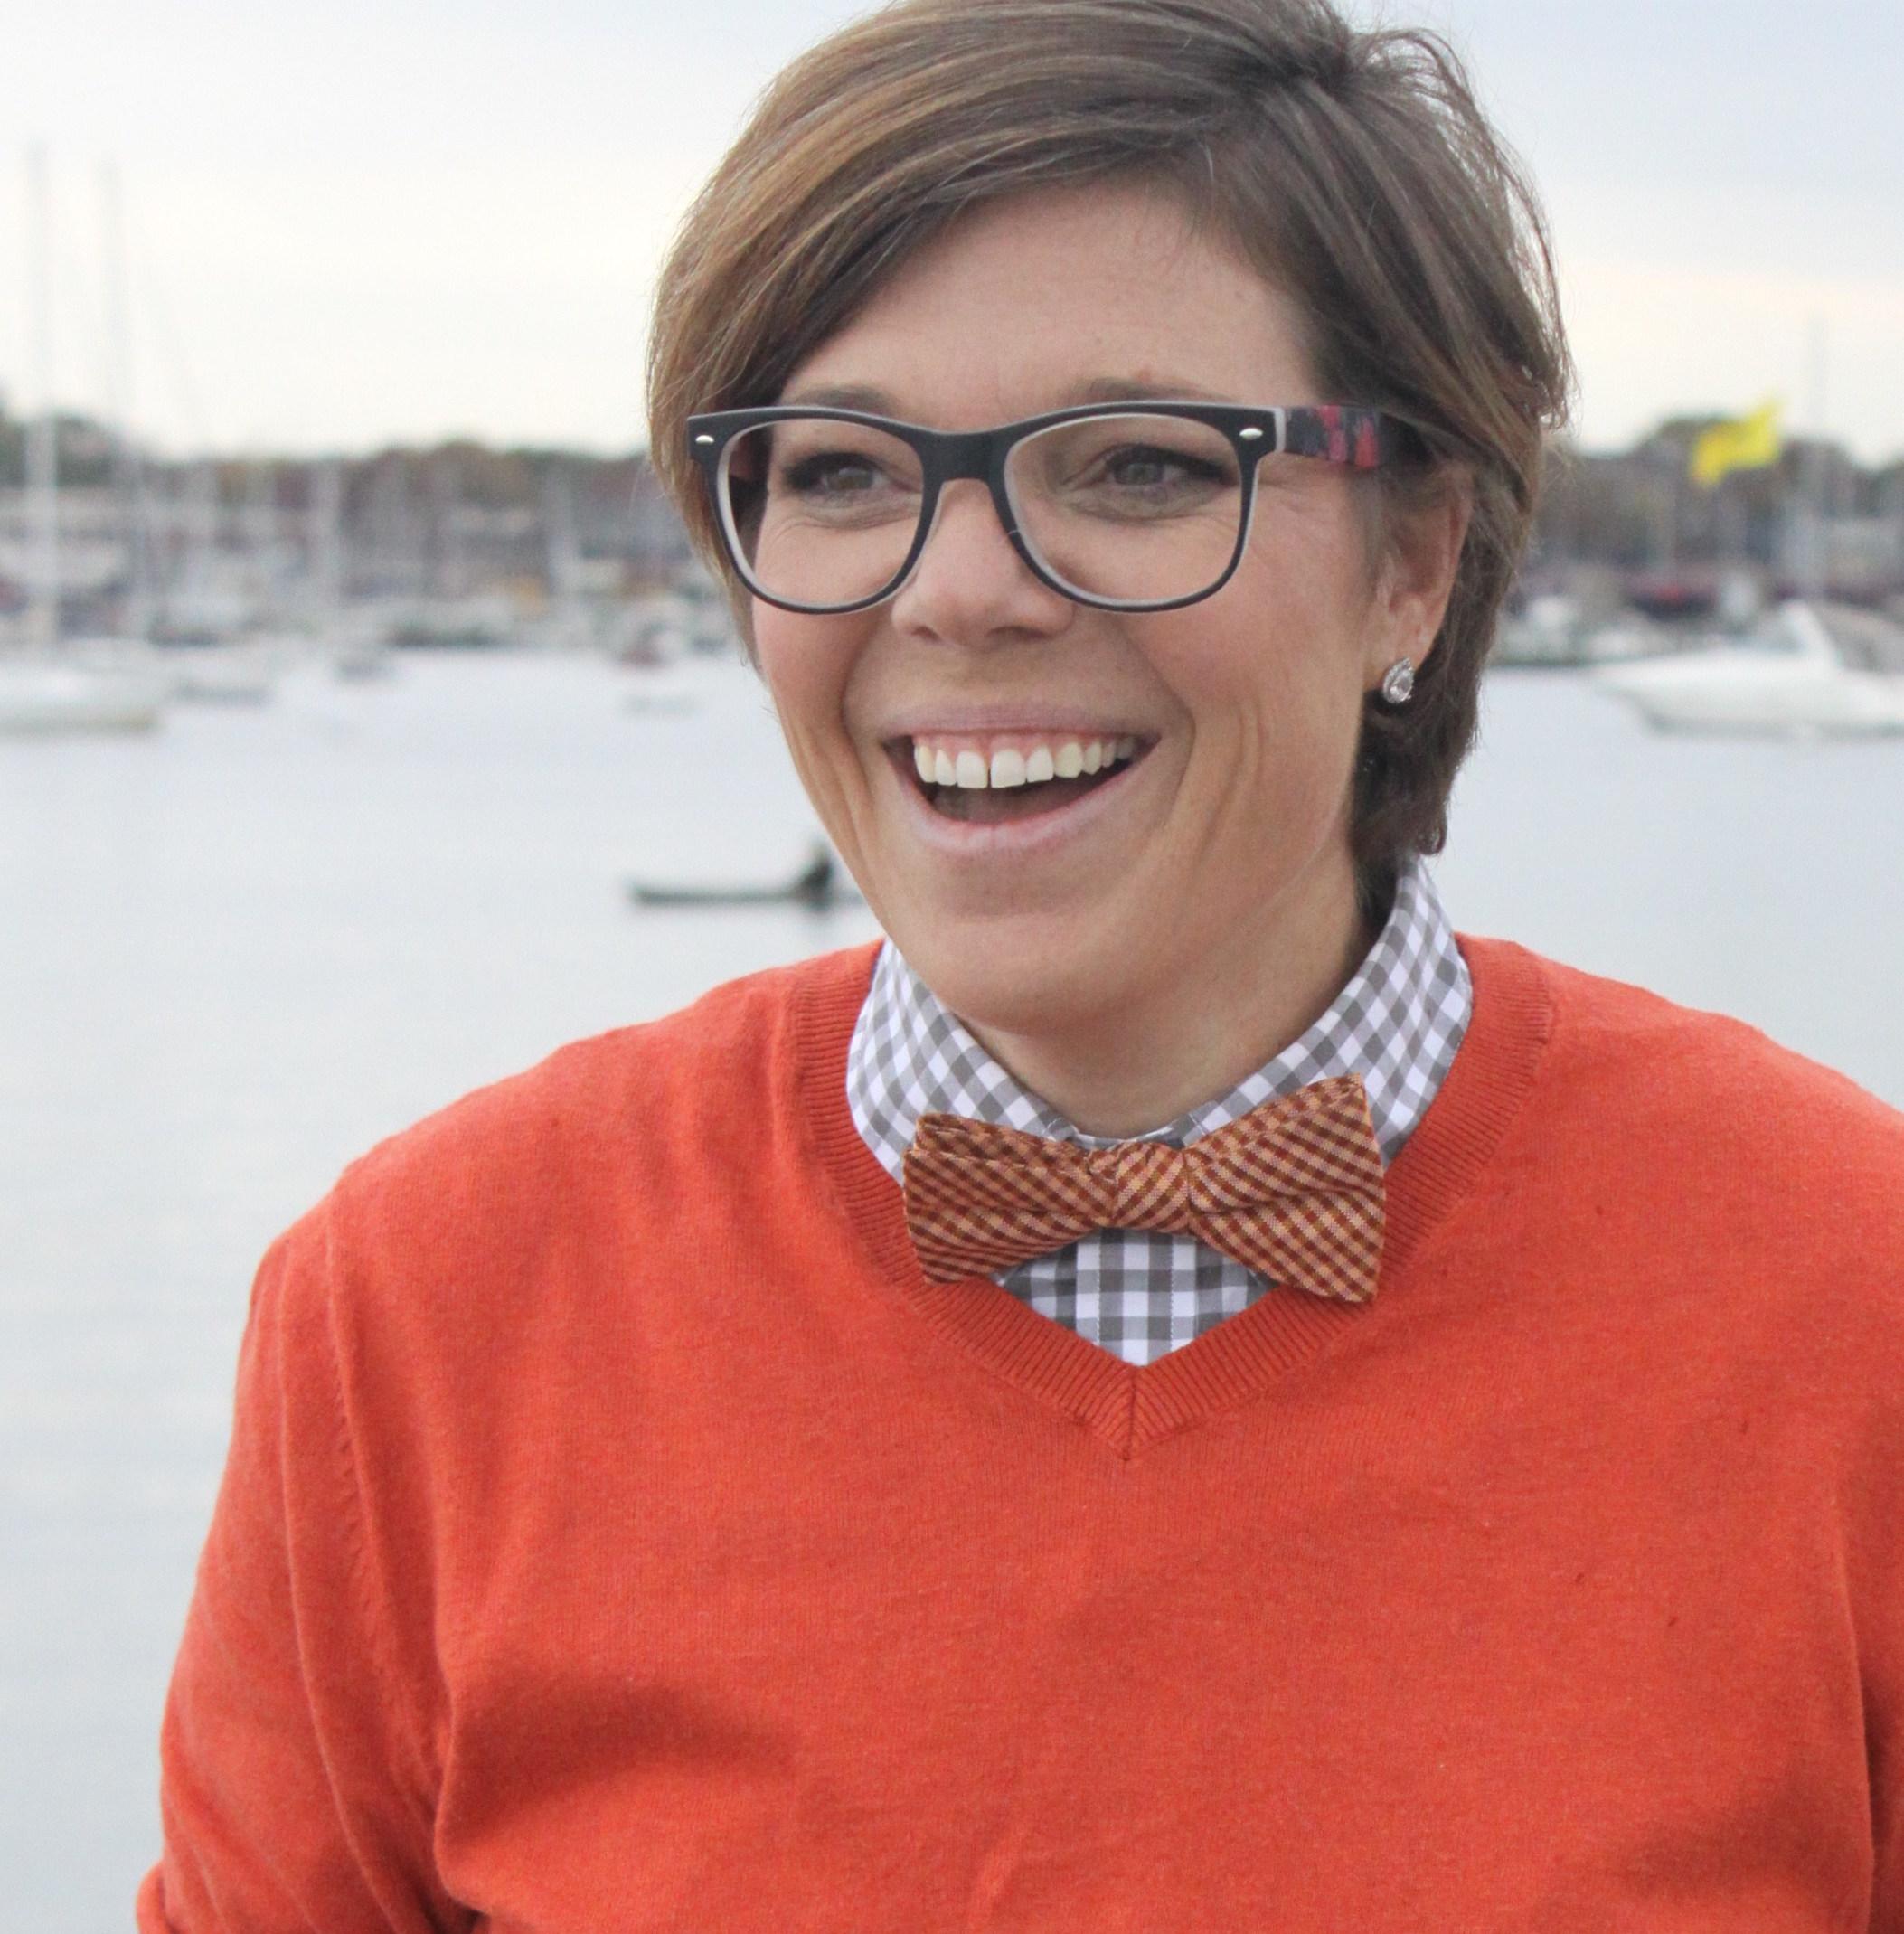 Tara Boertzel, Founder & CEO